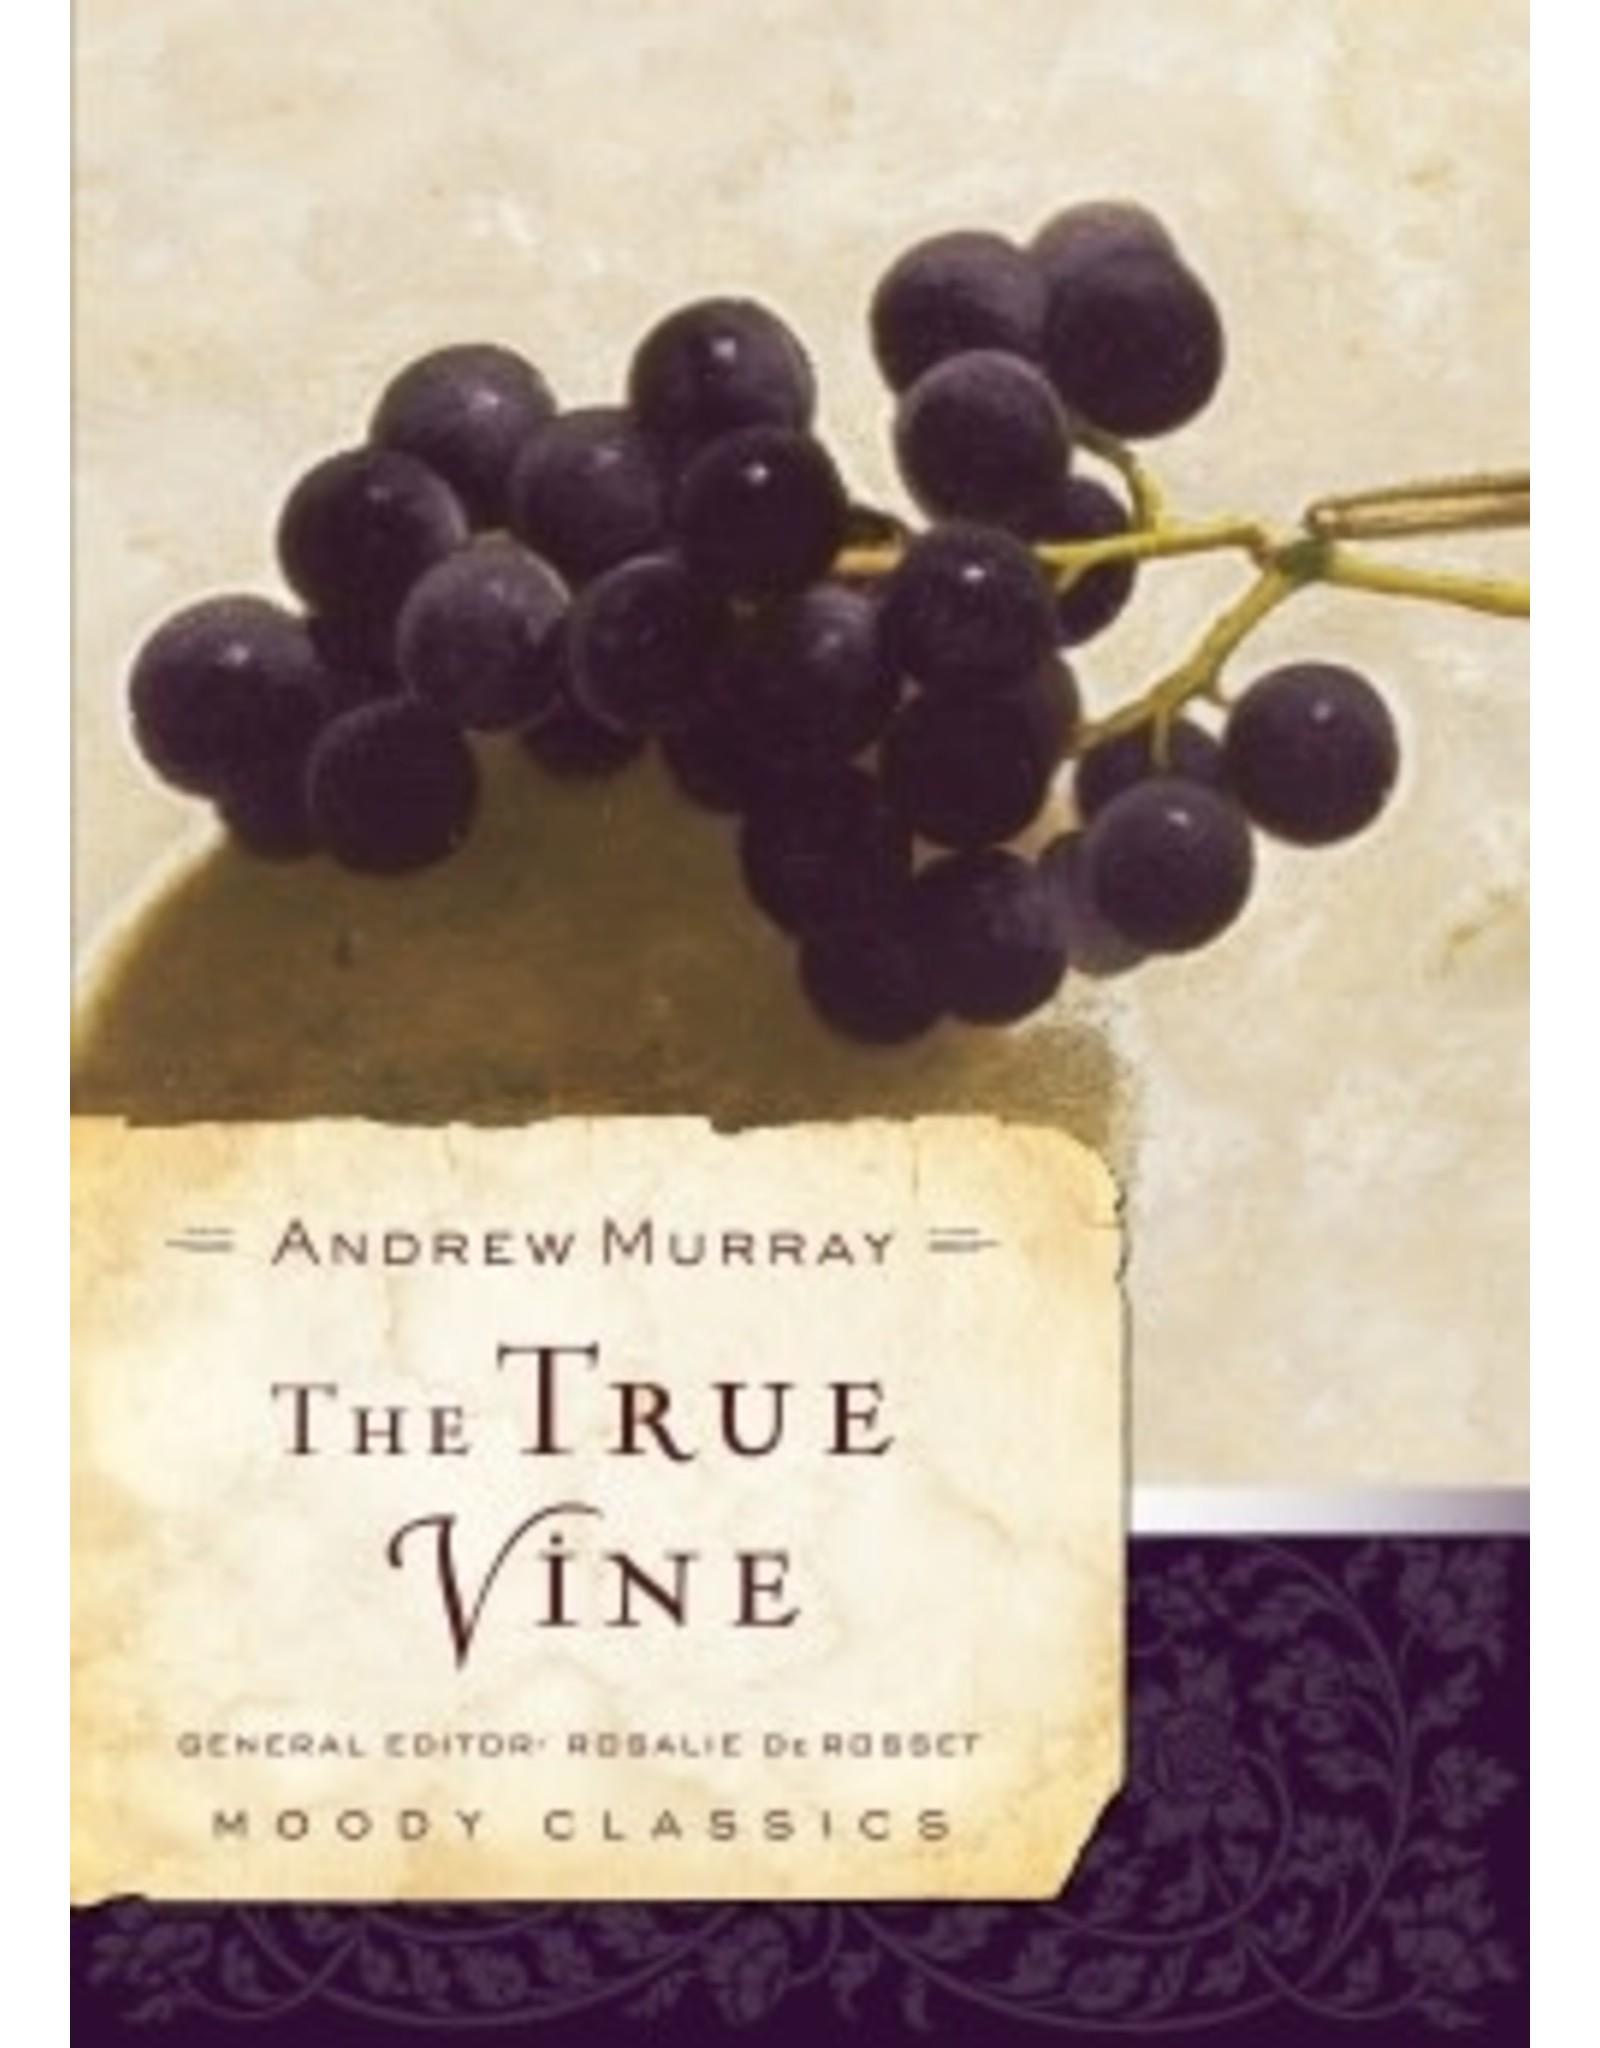 Murray The True Vine